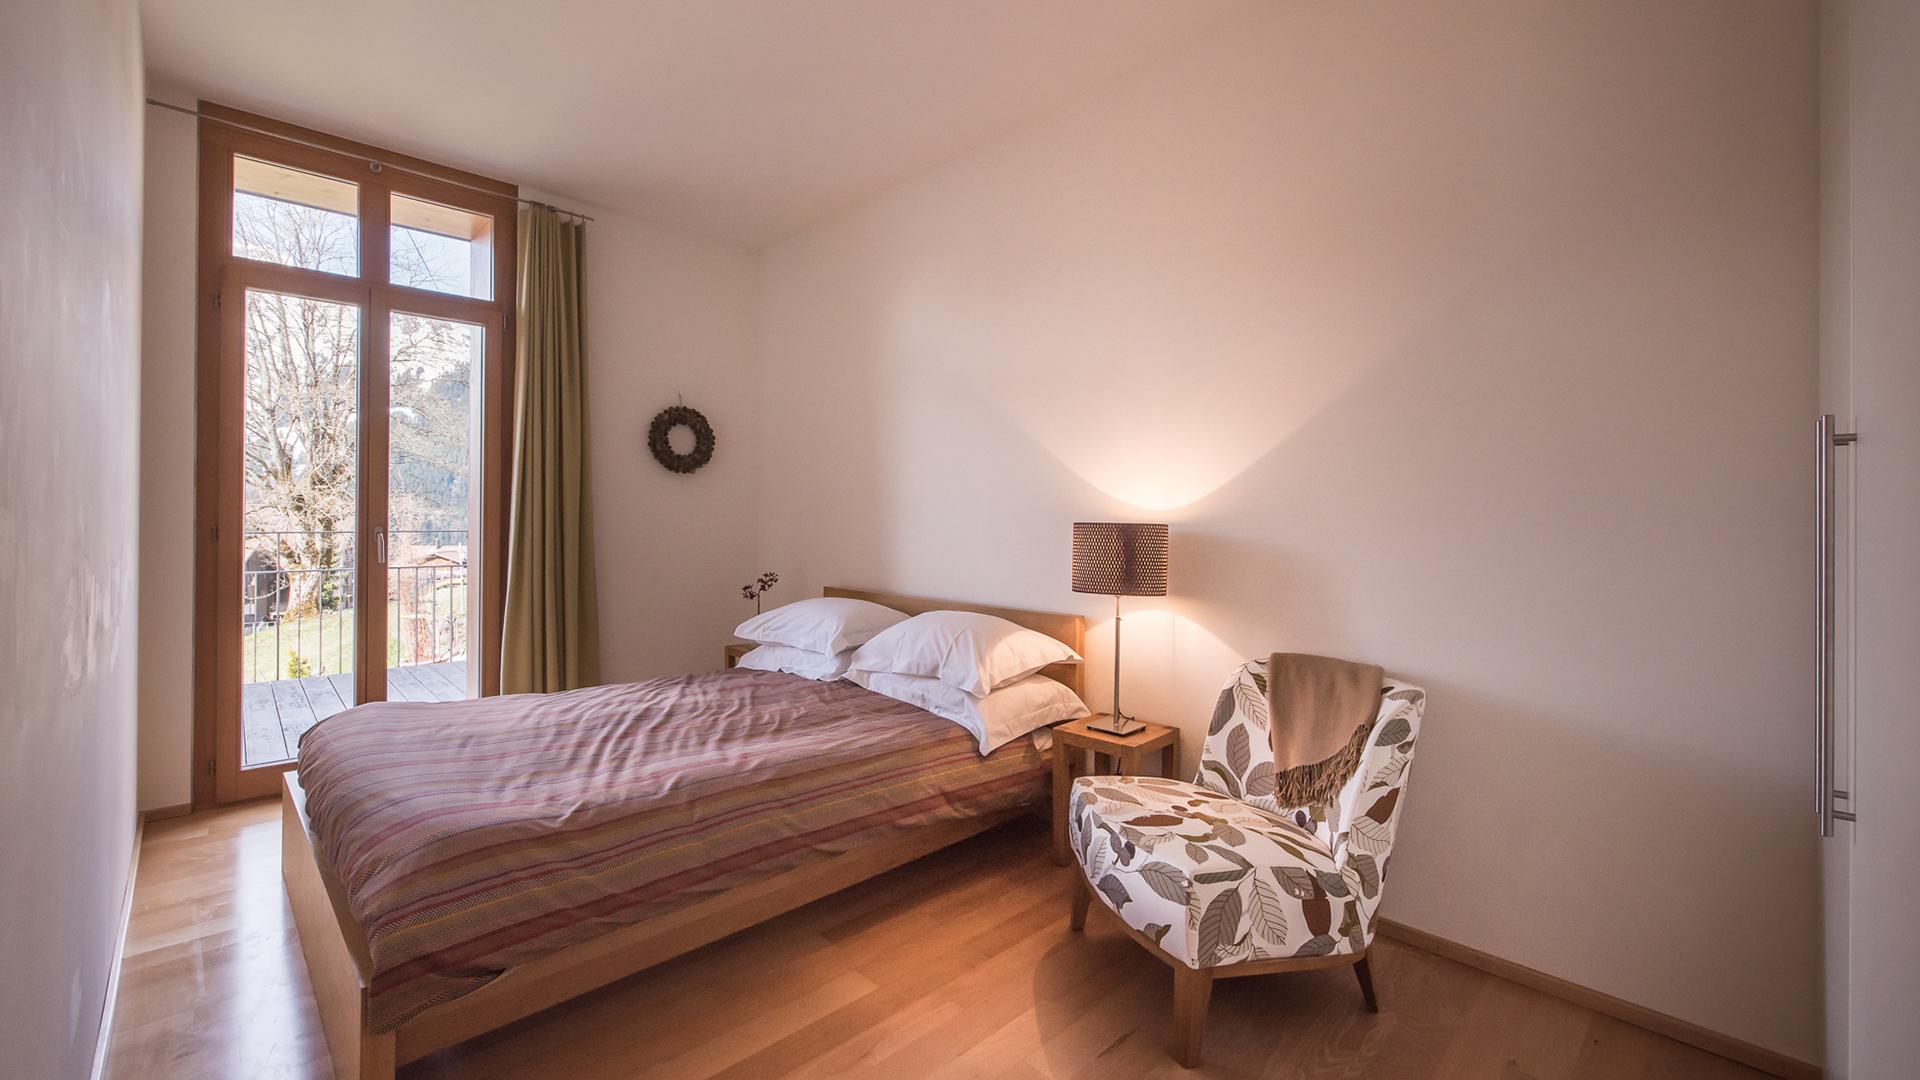 Eden Residence Apartments, Switzerland